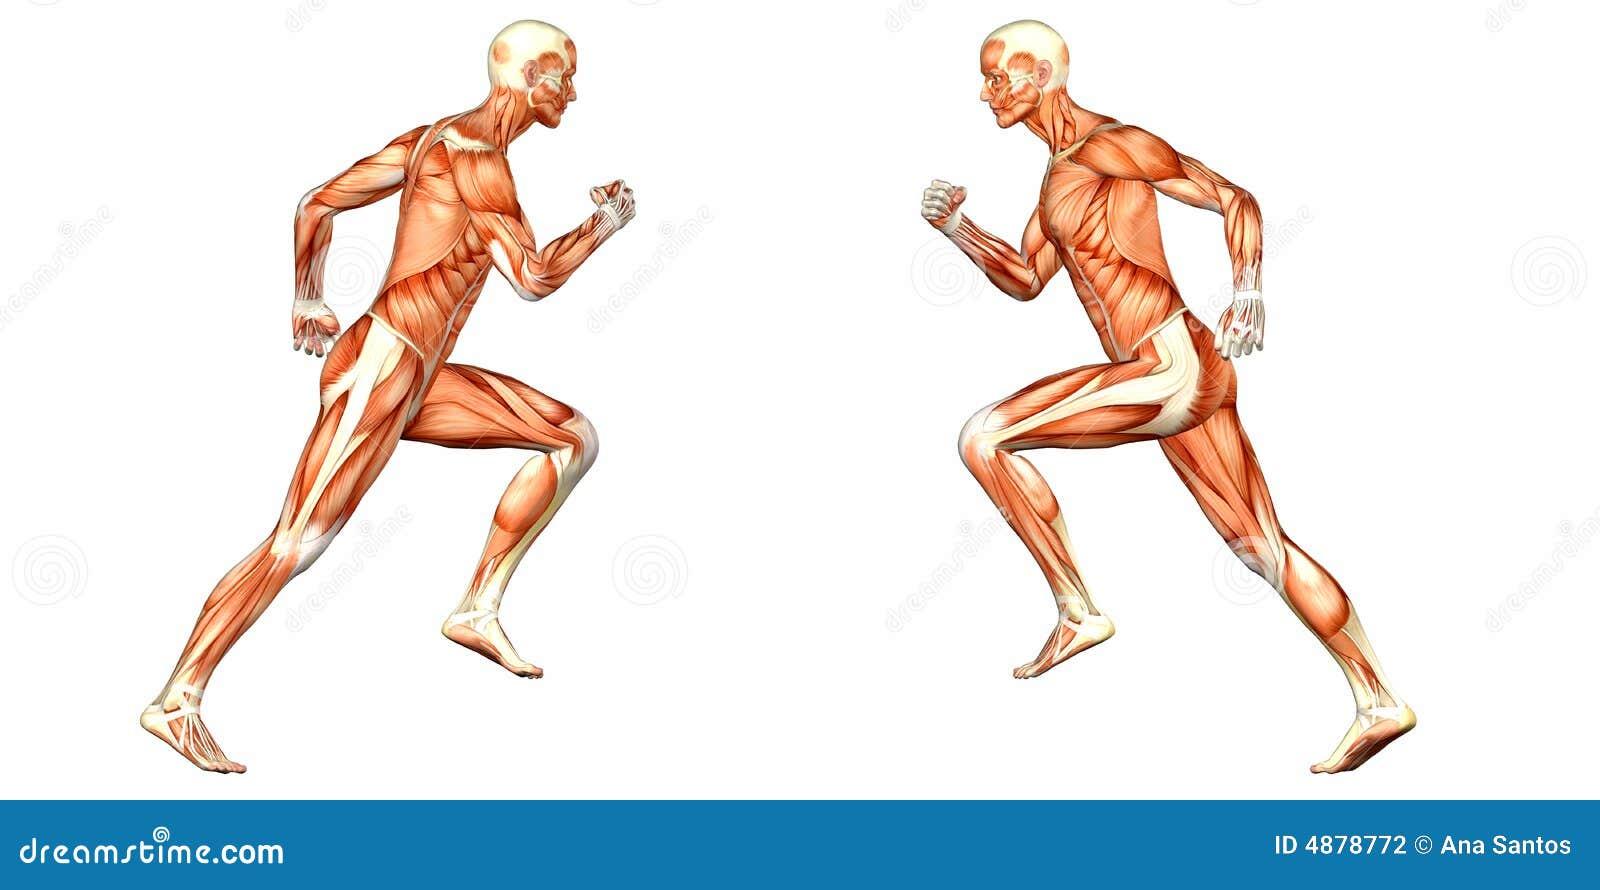 Male Human Body Anatomy stock illustration. Illustration of anatomic ...